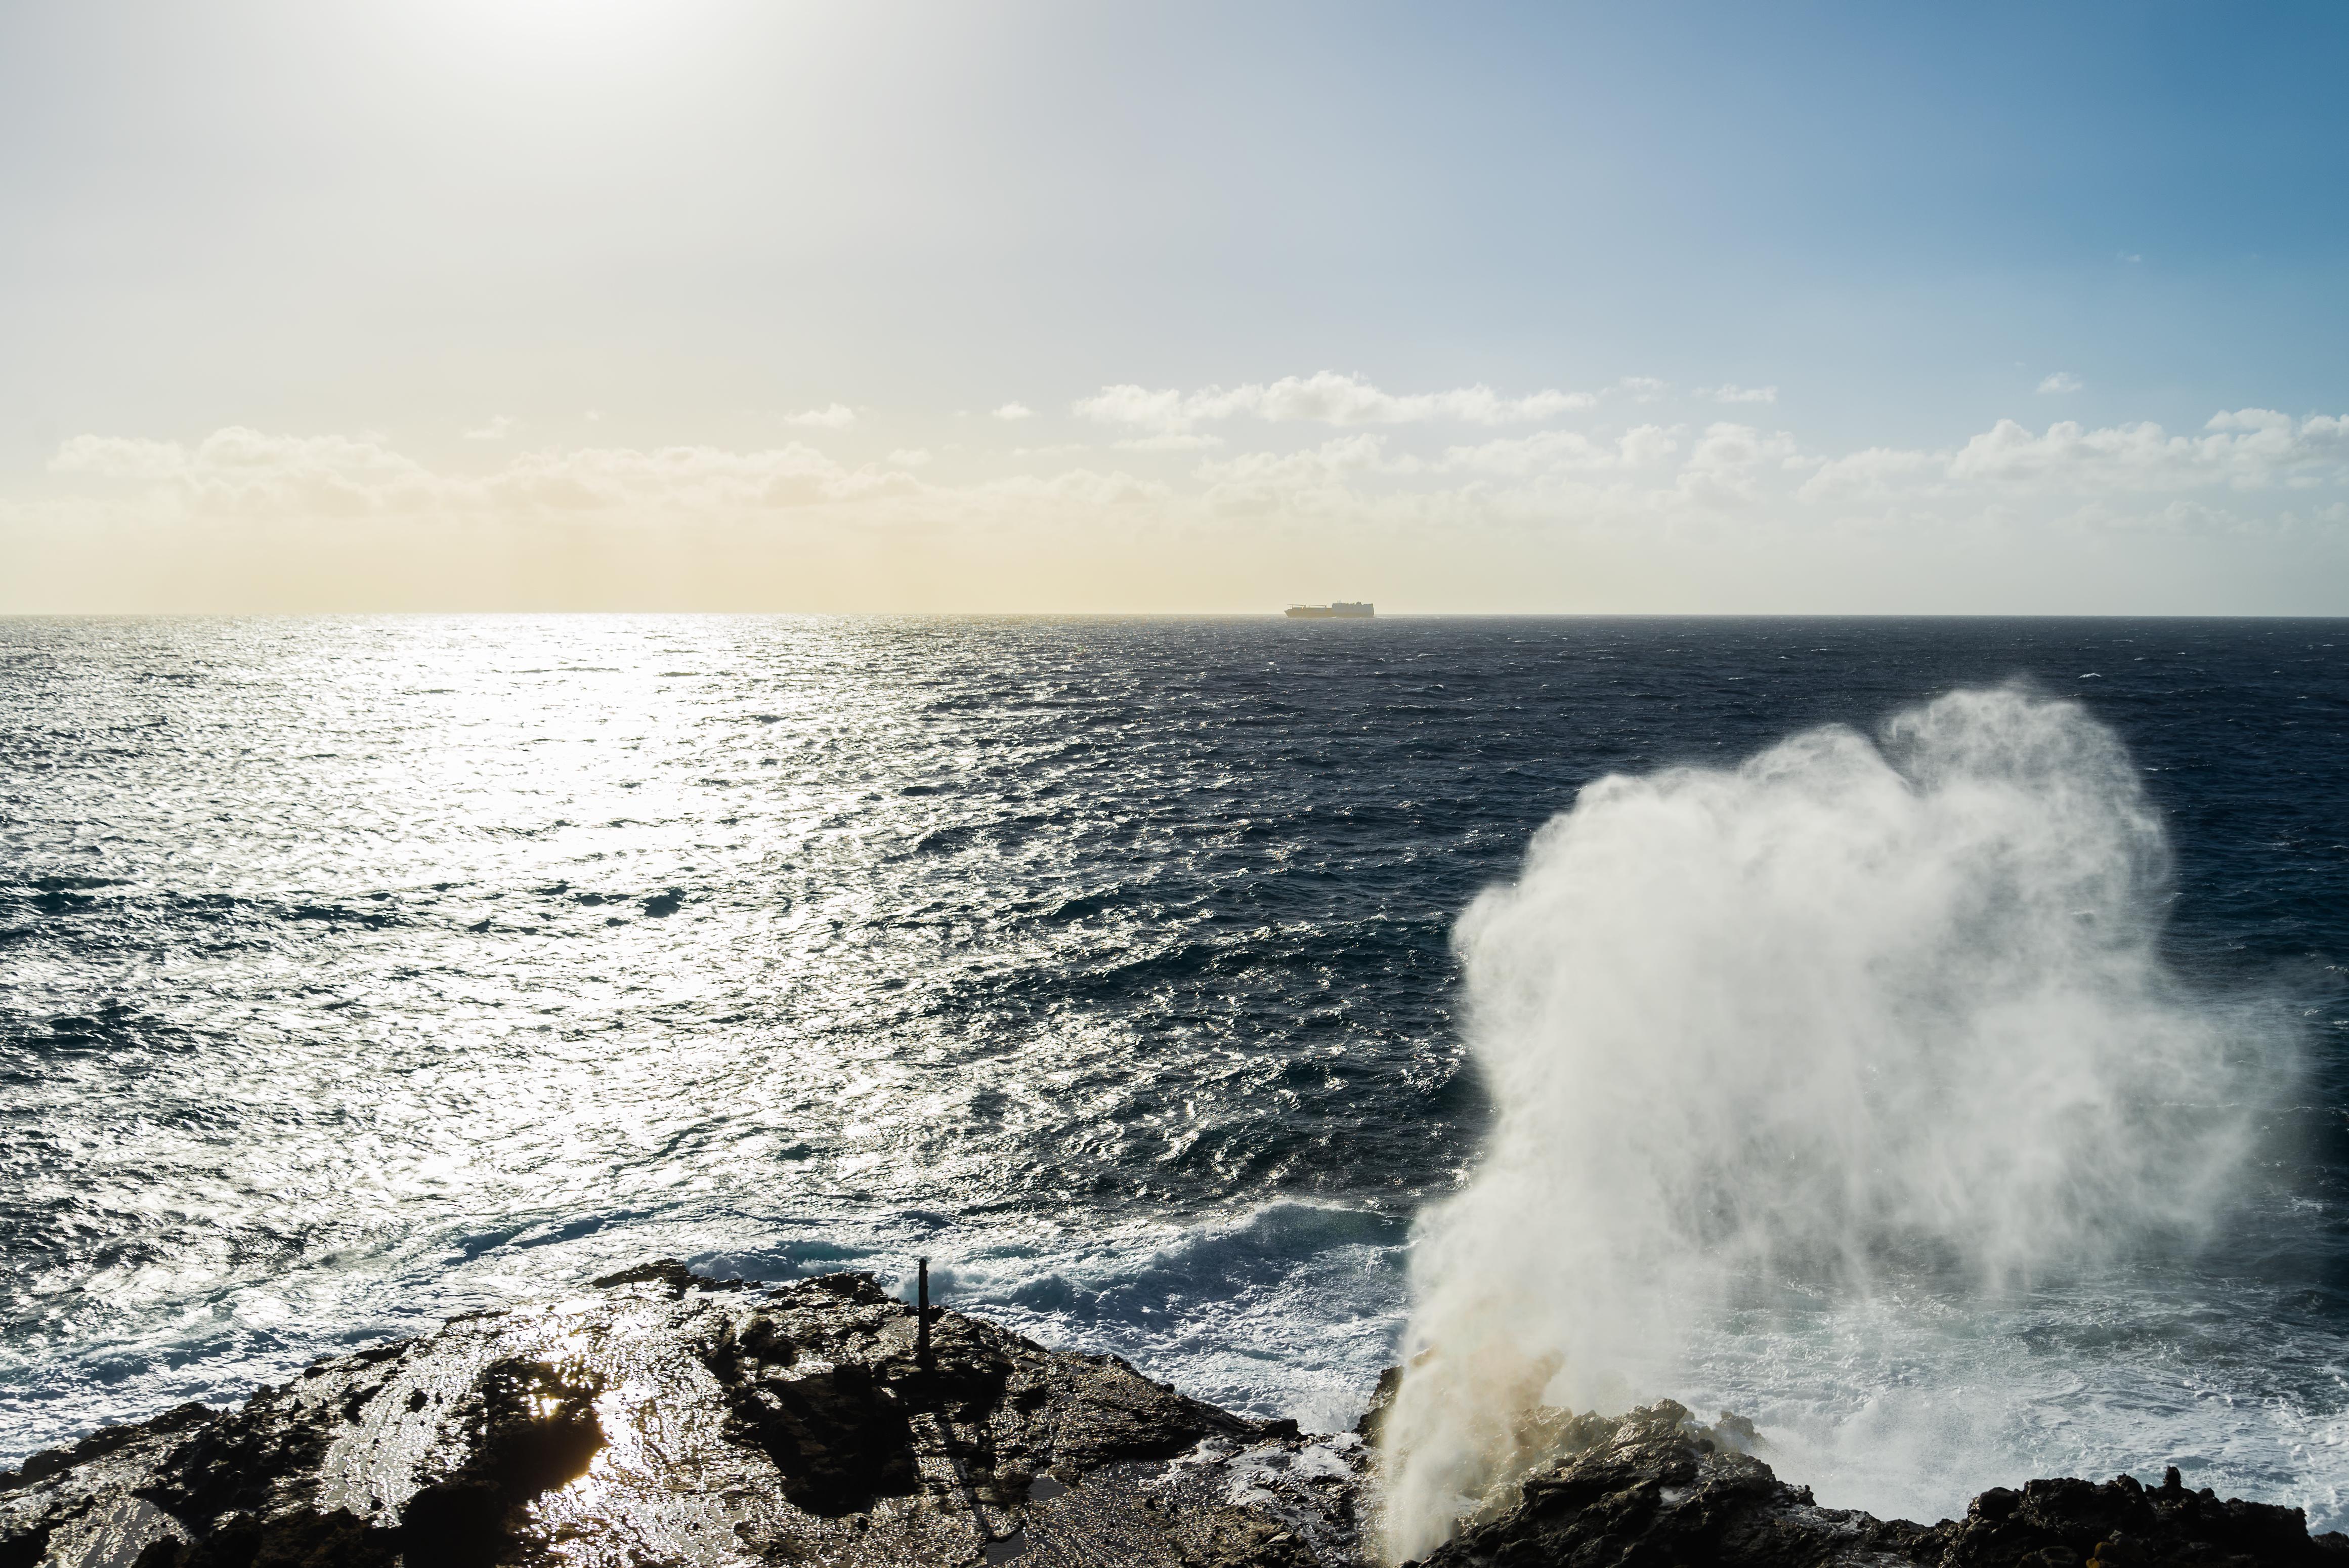 Halona Blowhole on the island of O'ahu[OC][4643x3099]